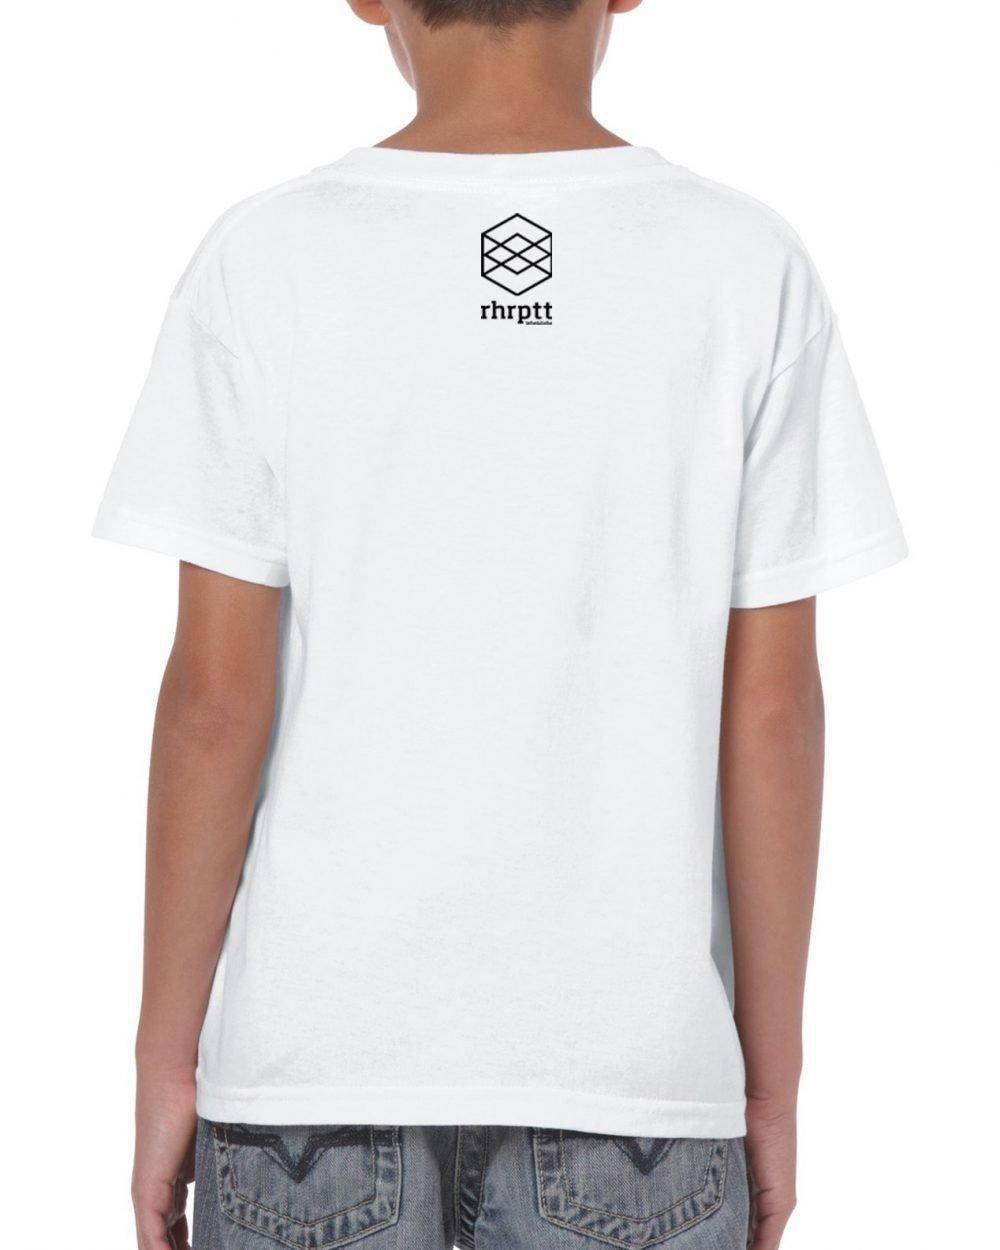 rhrptt kinder t-shirt hinten brandlogo